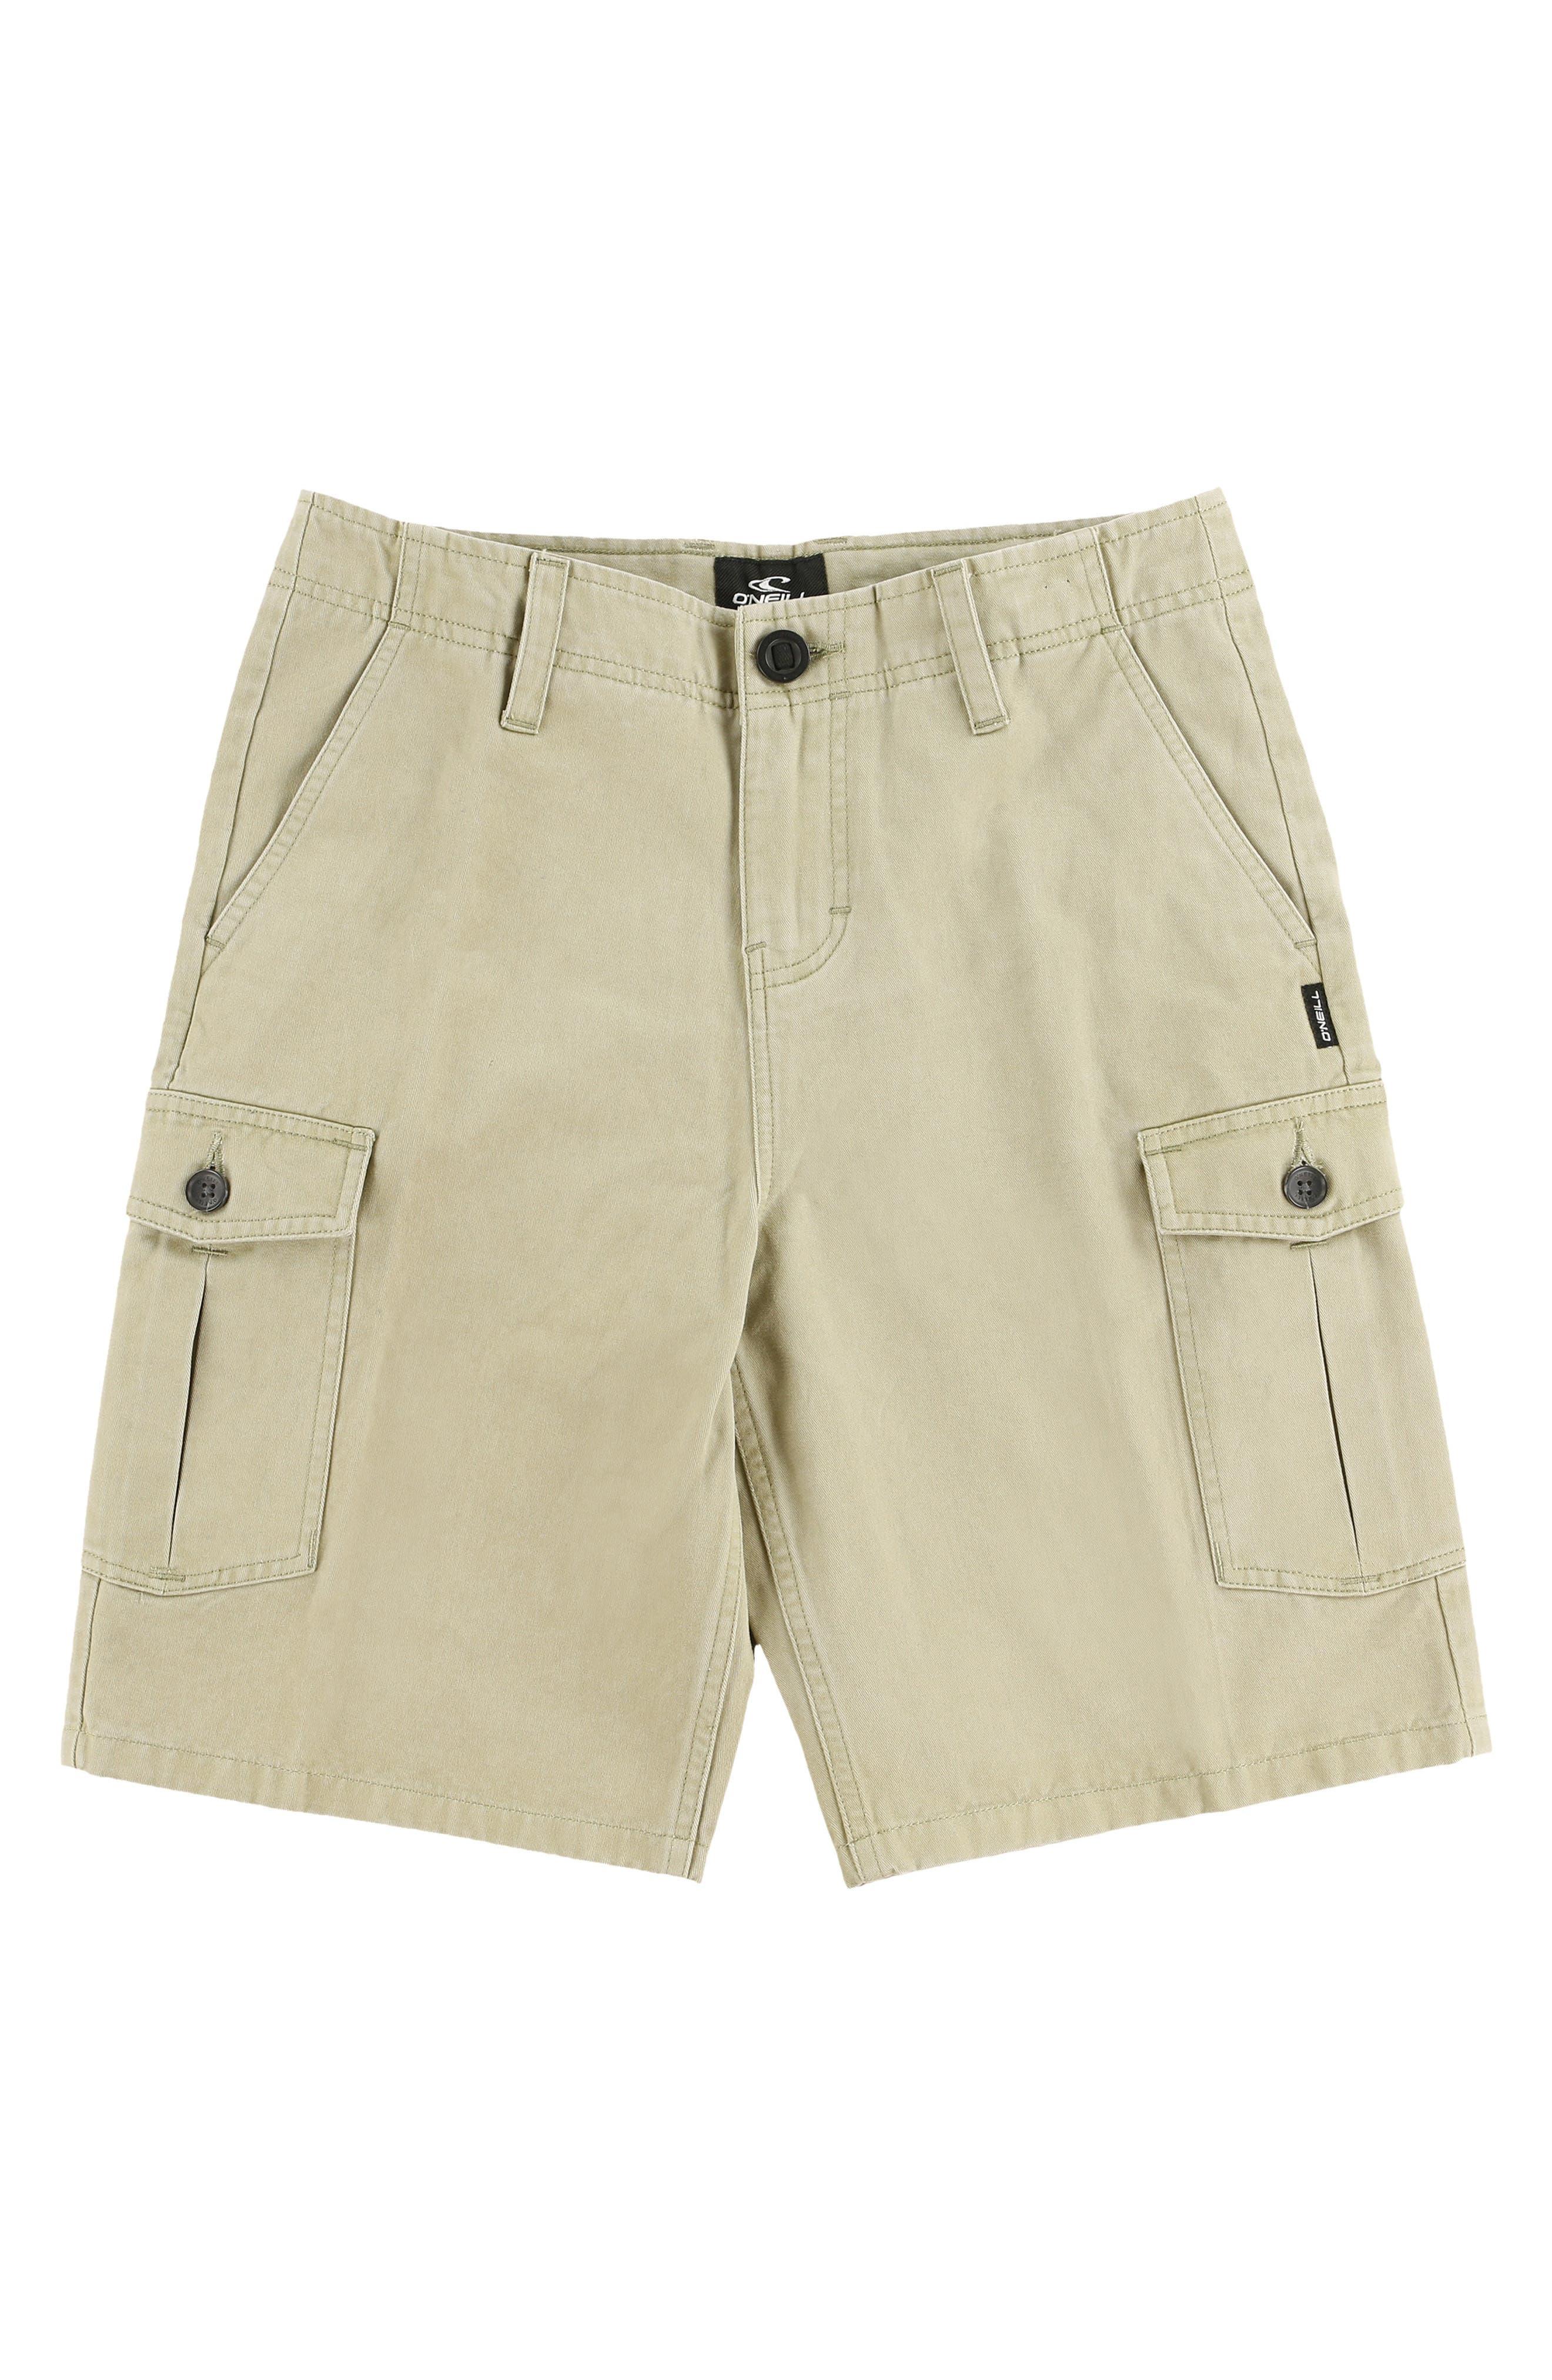 Johnny Cargo Shorts,                             Main thumbnail 1, color,                             251